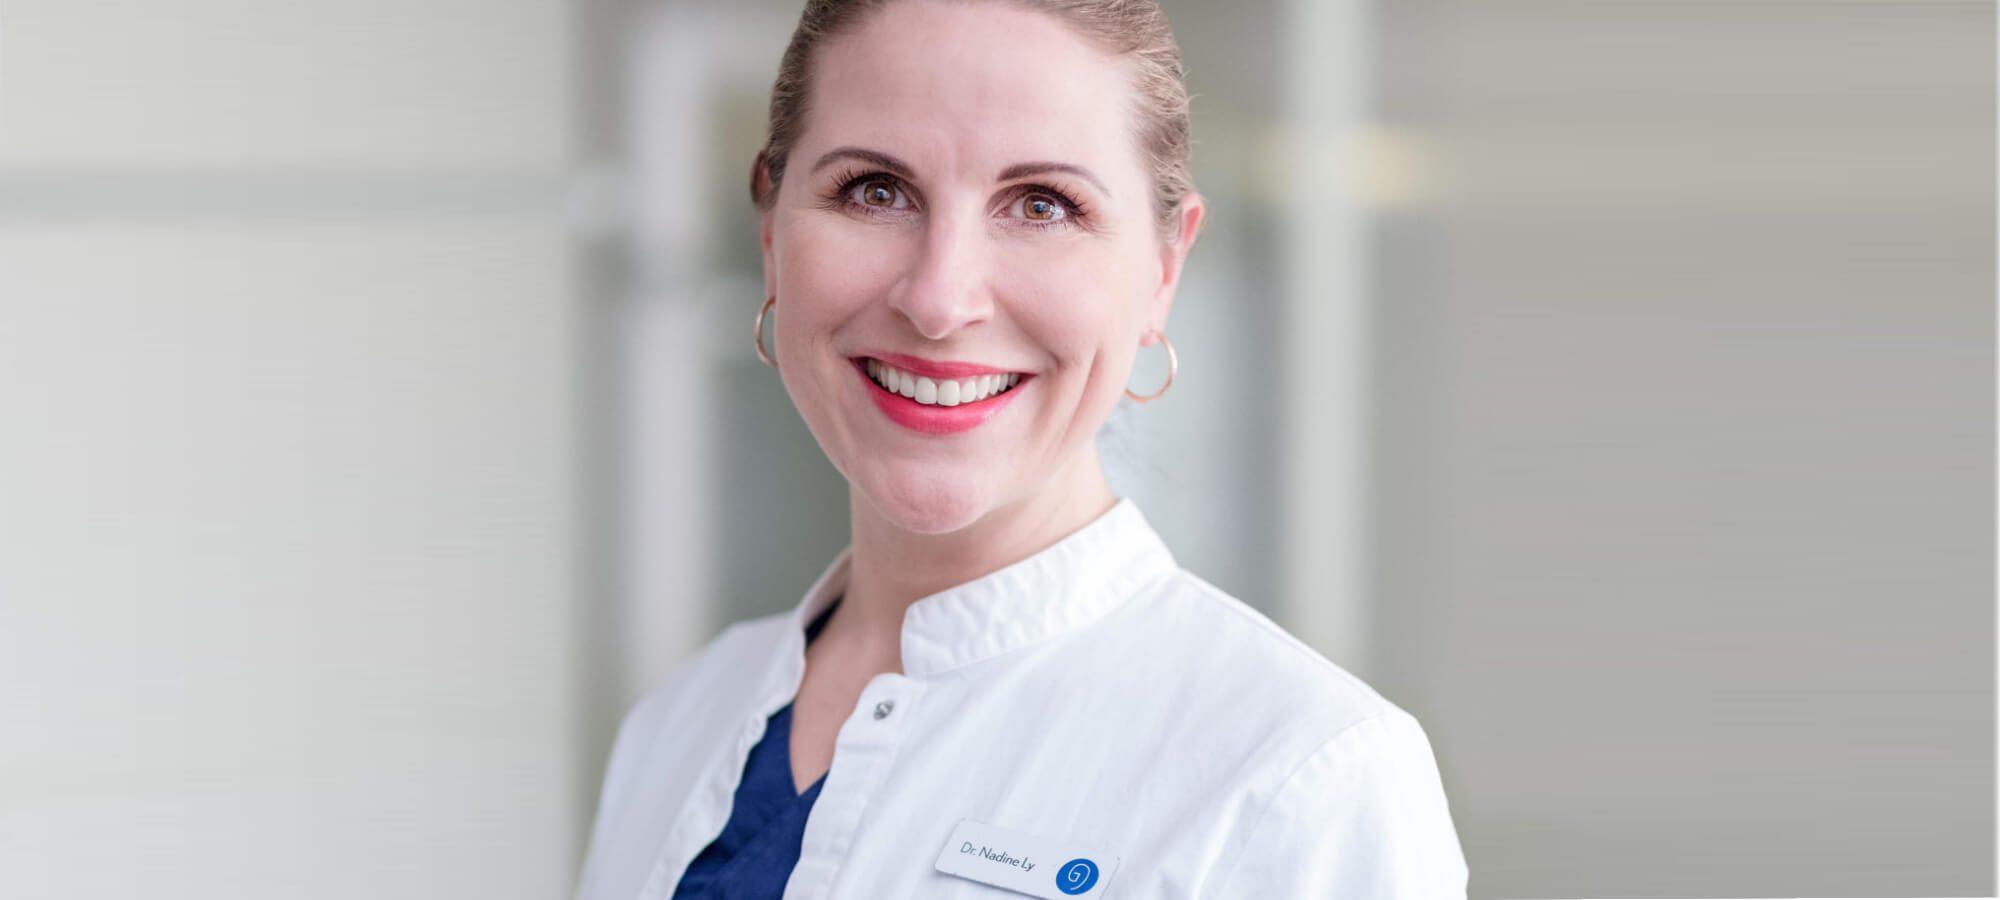 Zahnärztin Dr. med. Nadine Ly in Frankfurt   groisman & laube